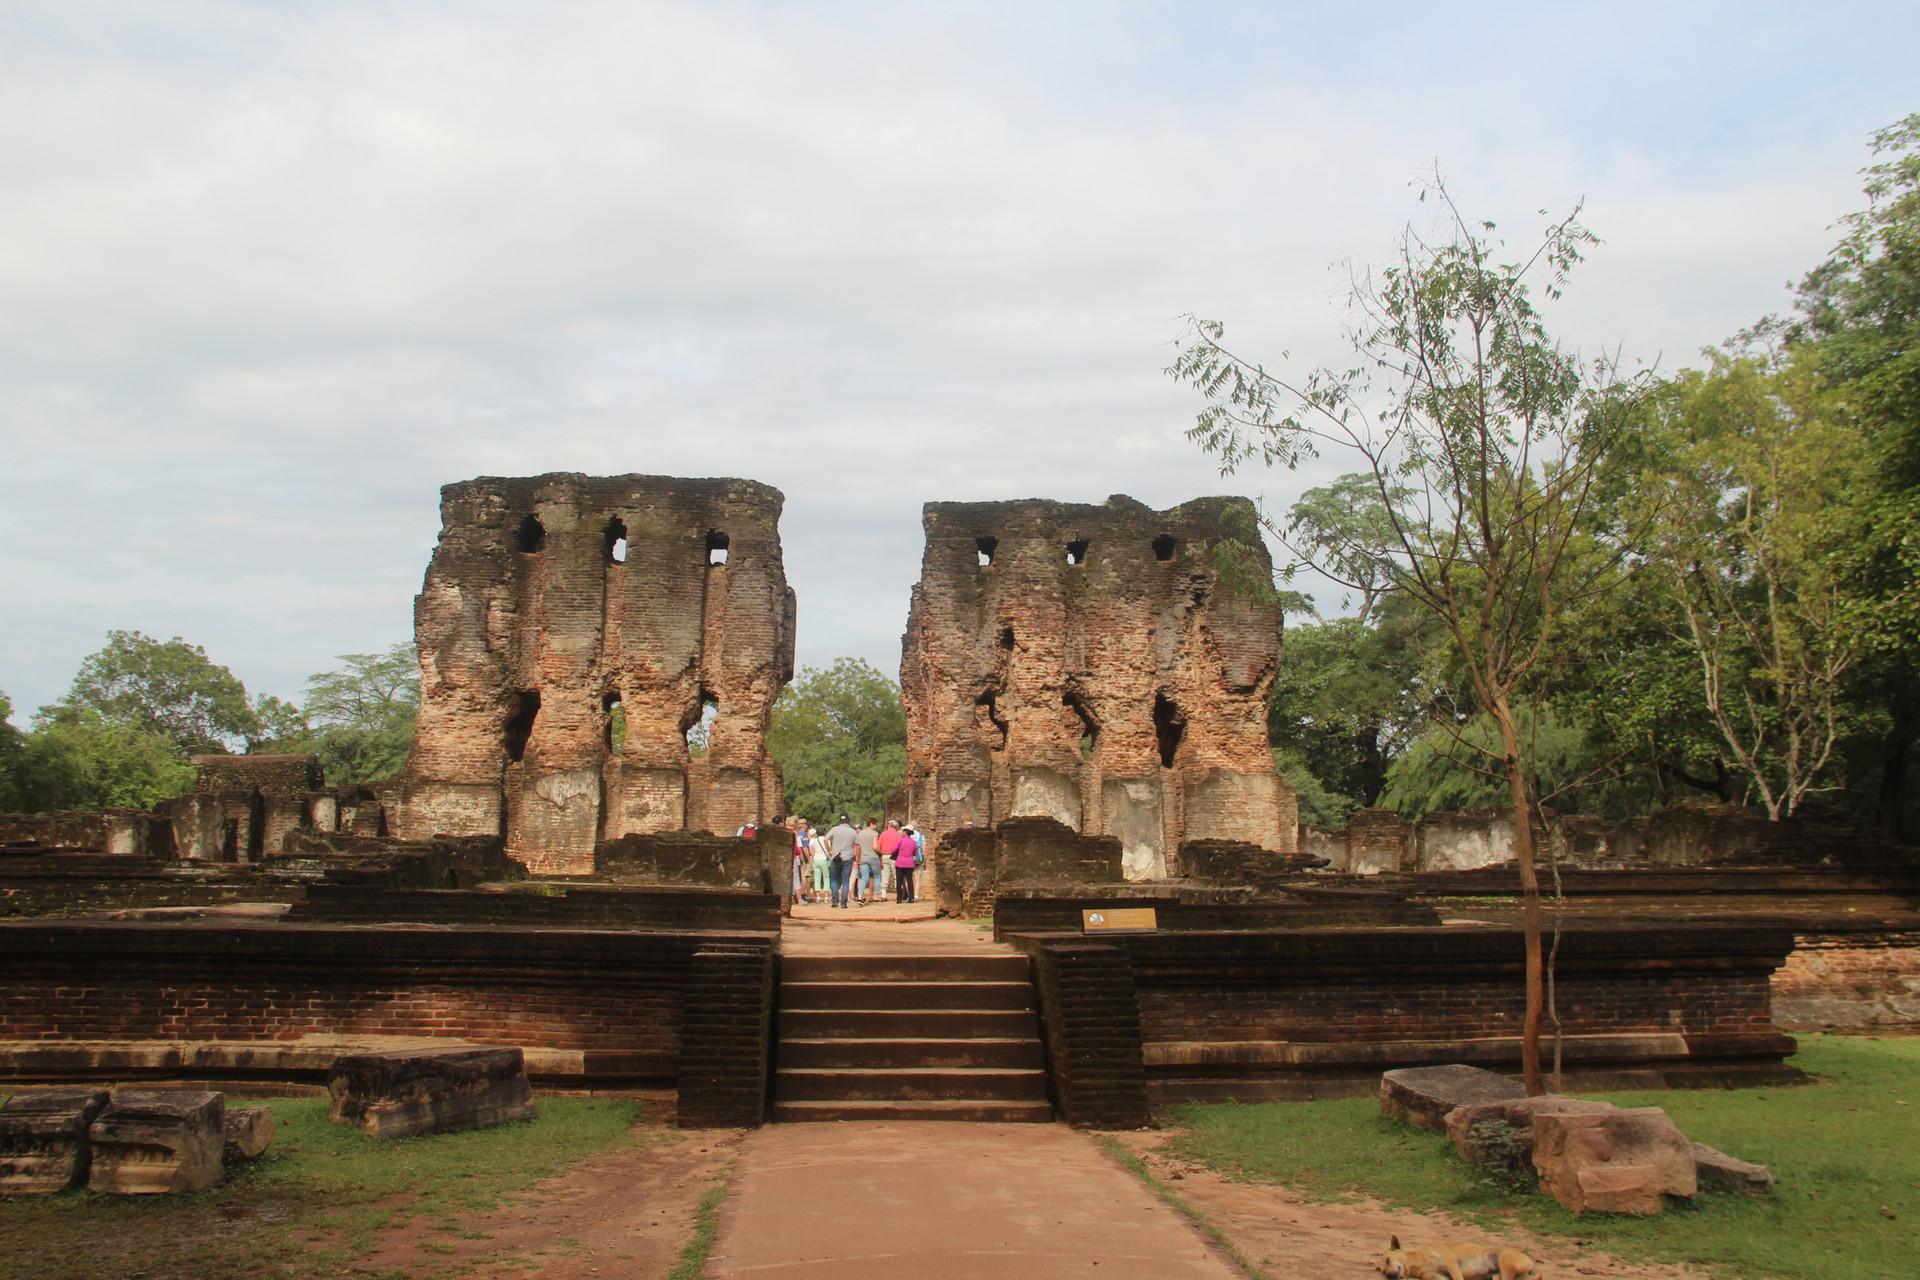 Visiter Polonnaruwa à vélo